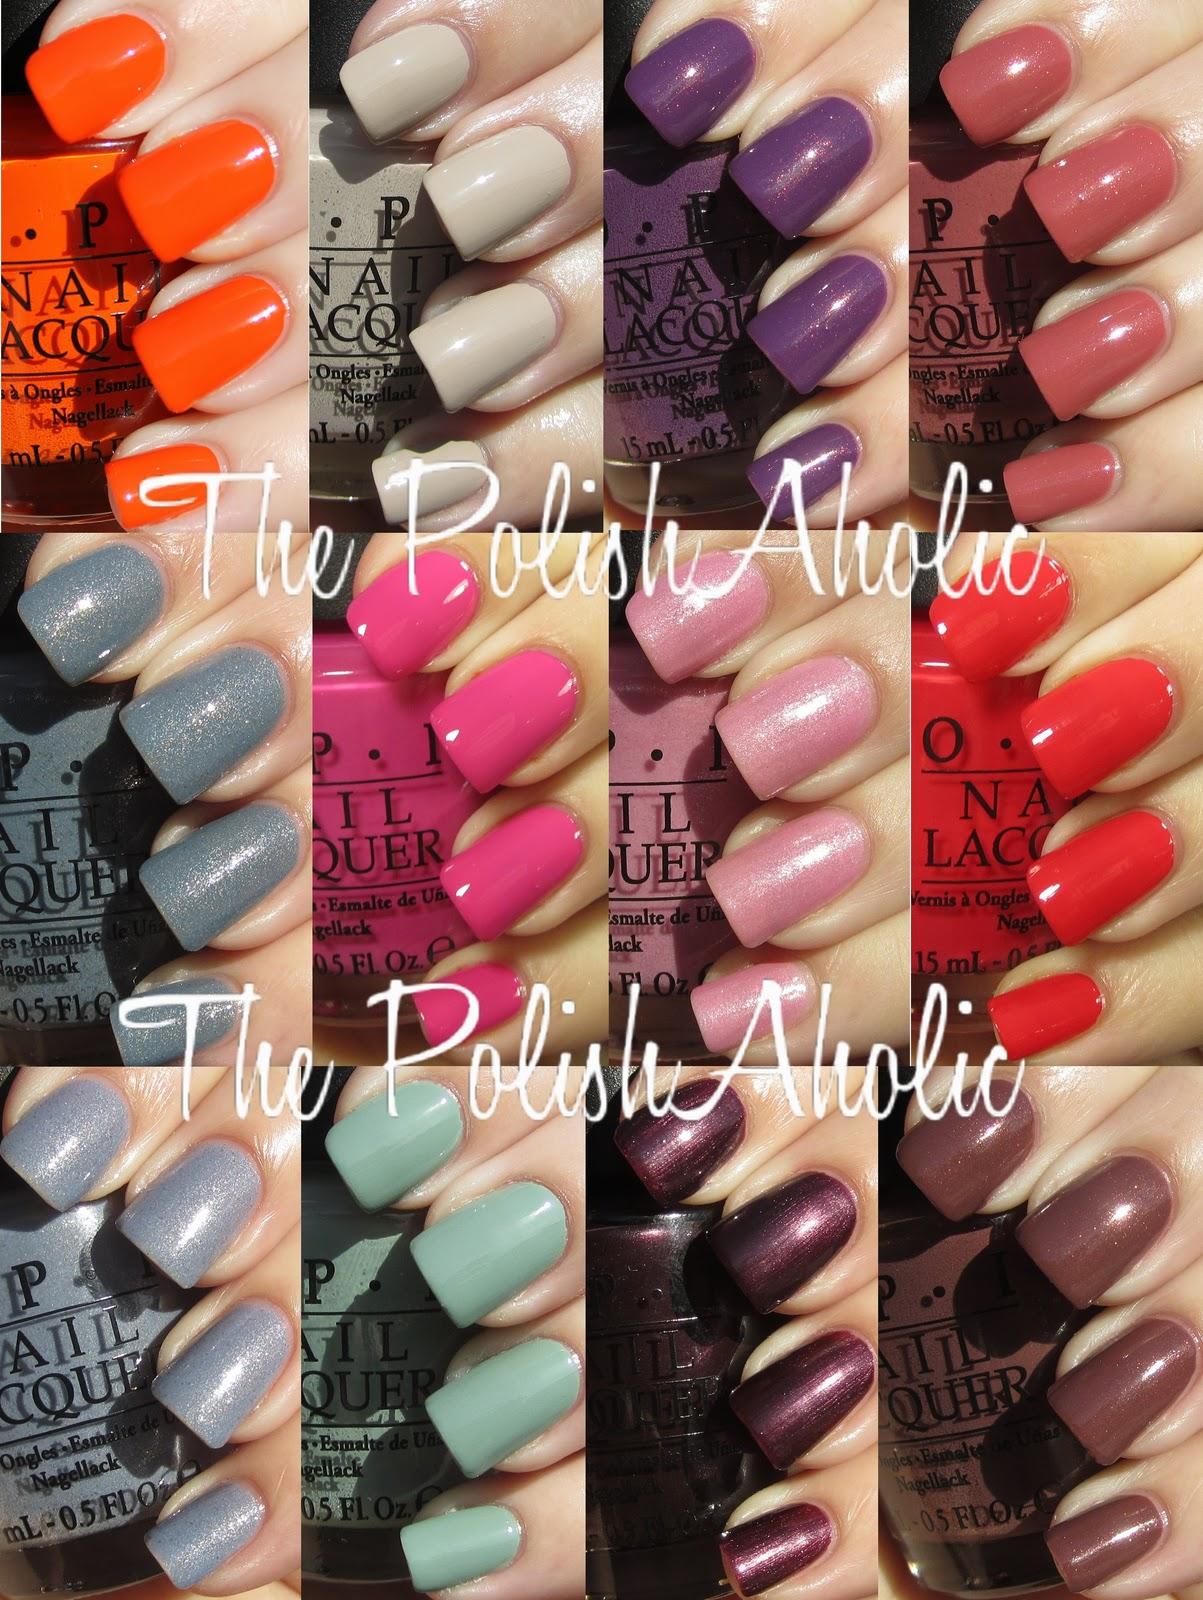 Where To Buy Opi Gel Nail Polish Nails Ideas